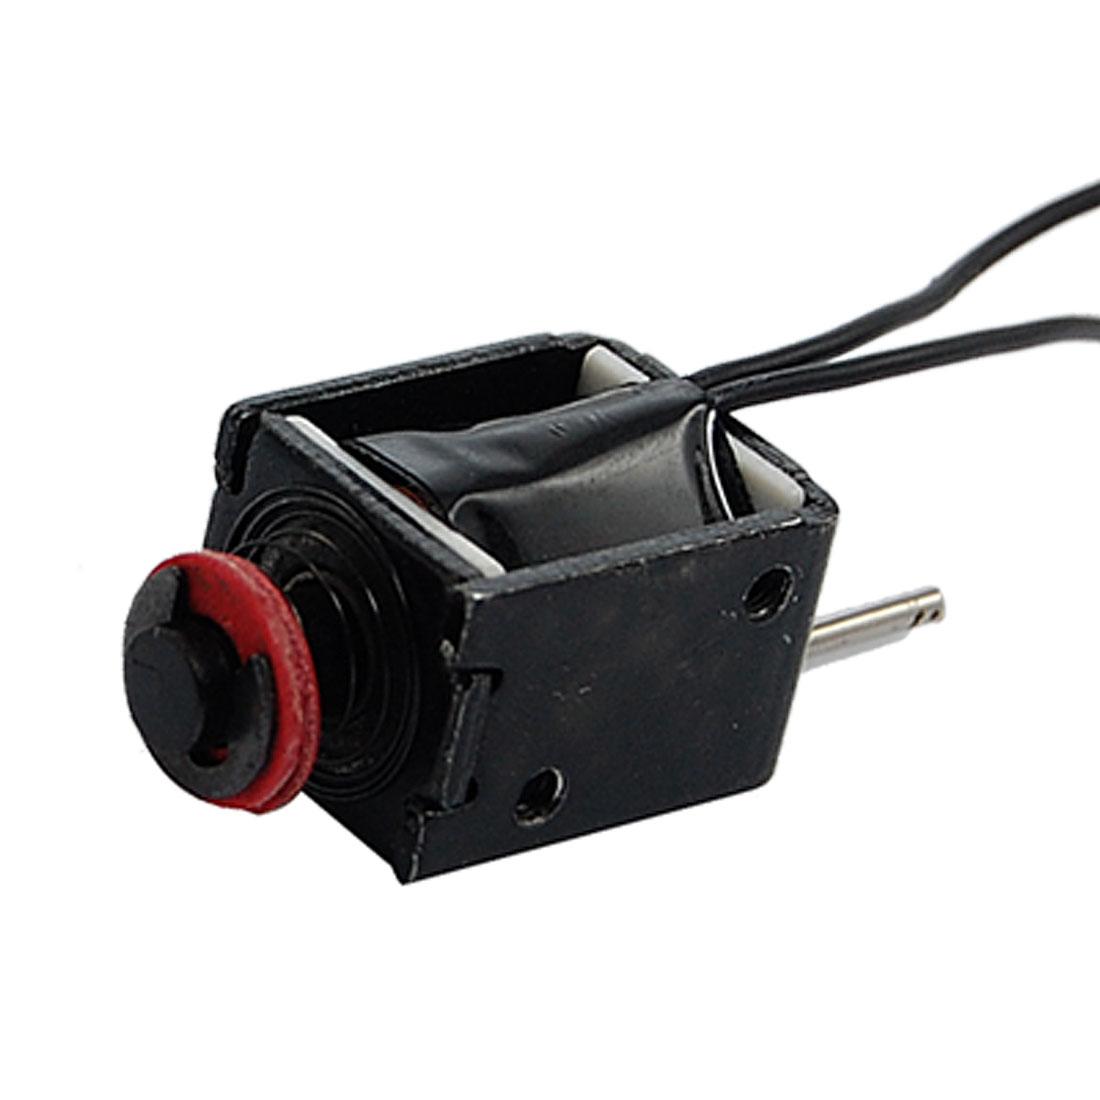 DC 24V 8.22W 0.34A Push Type 5mm Stroke Solenoid Electromagnet Coil